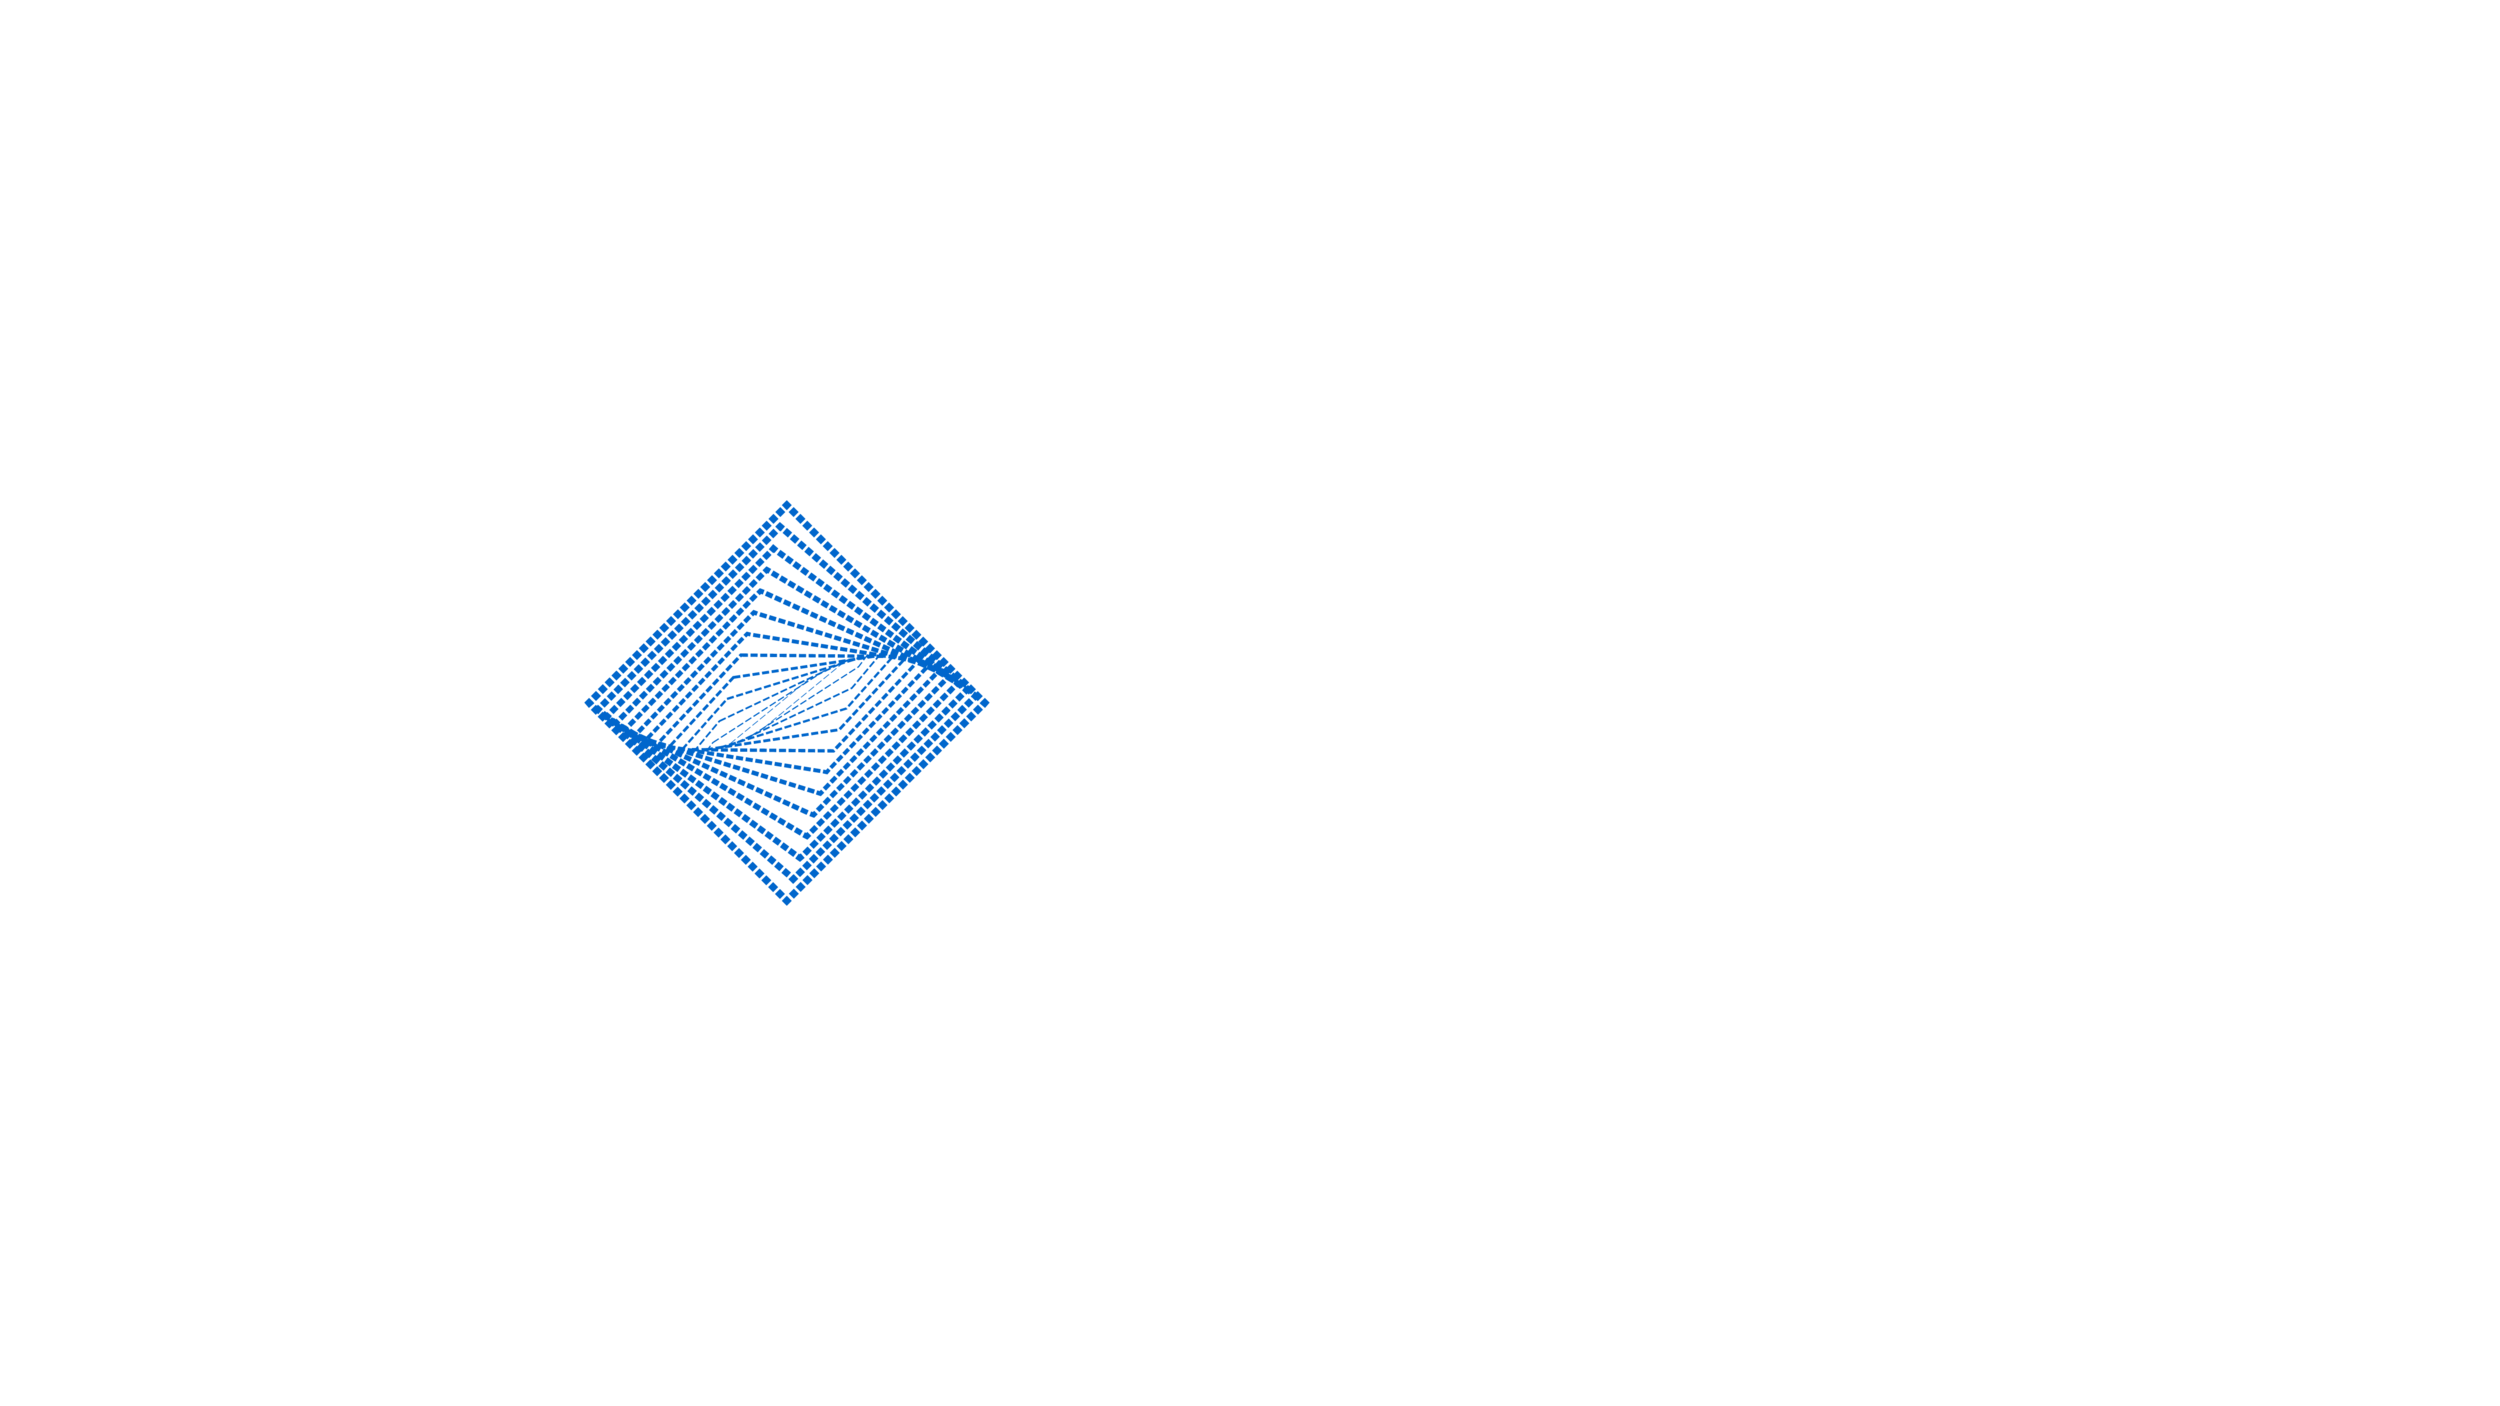 3dlive | AXO 2-transparent.png